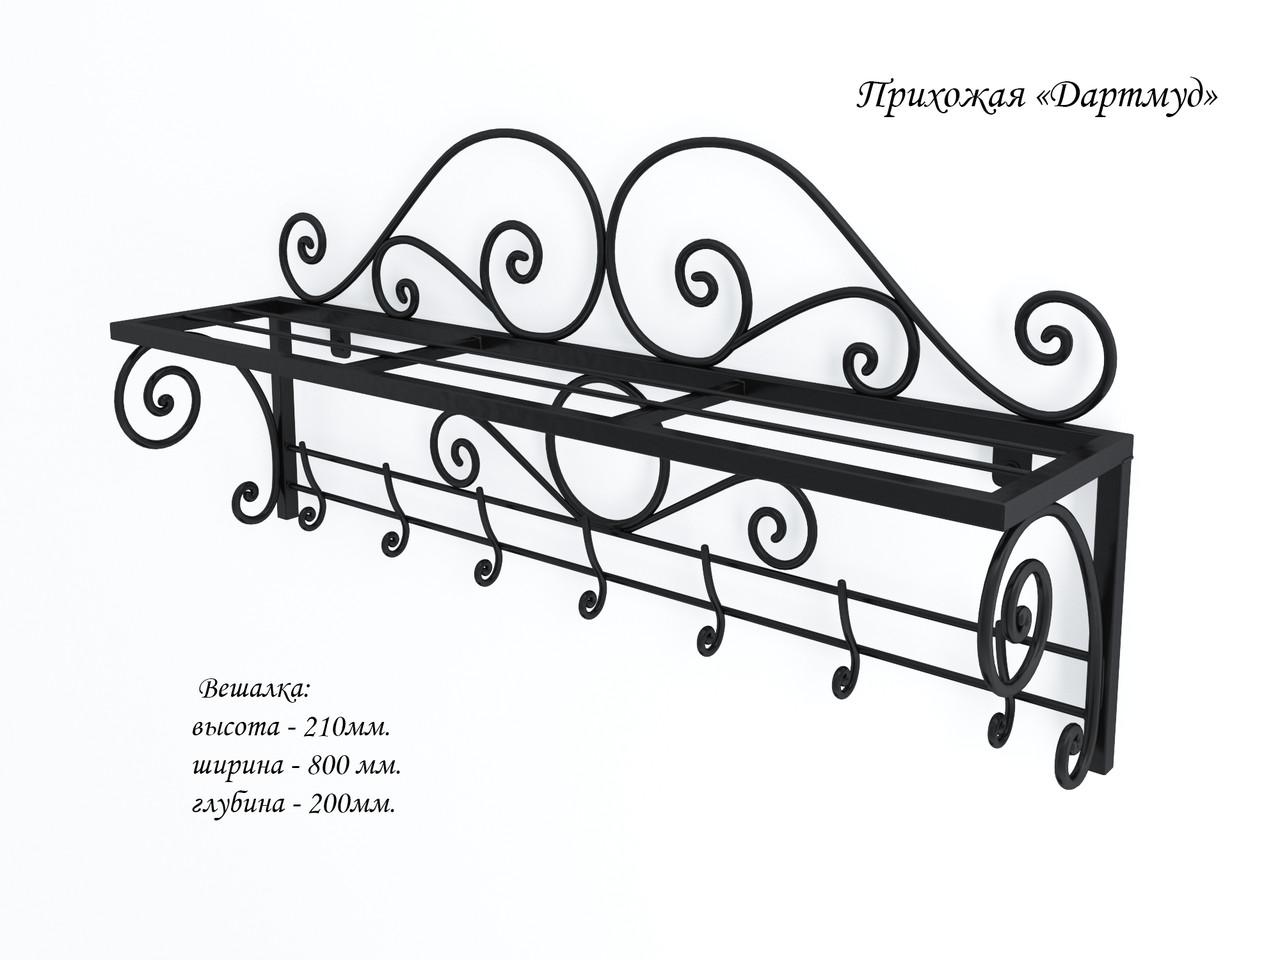 veshalka_dartmud_1.jpg